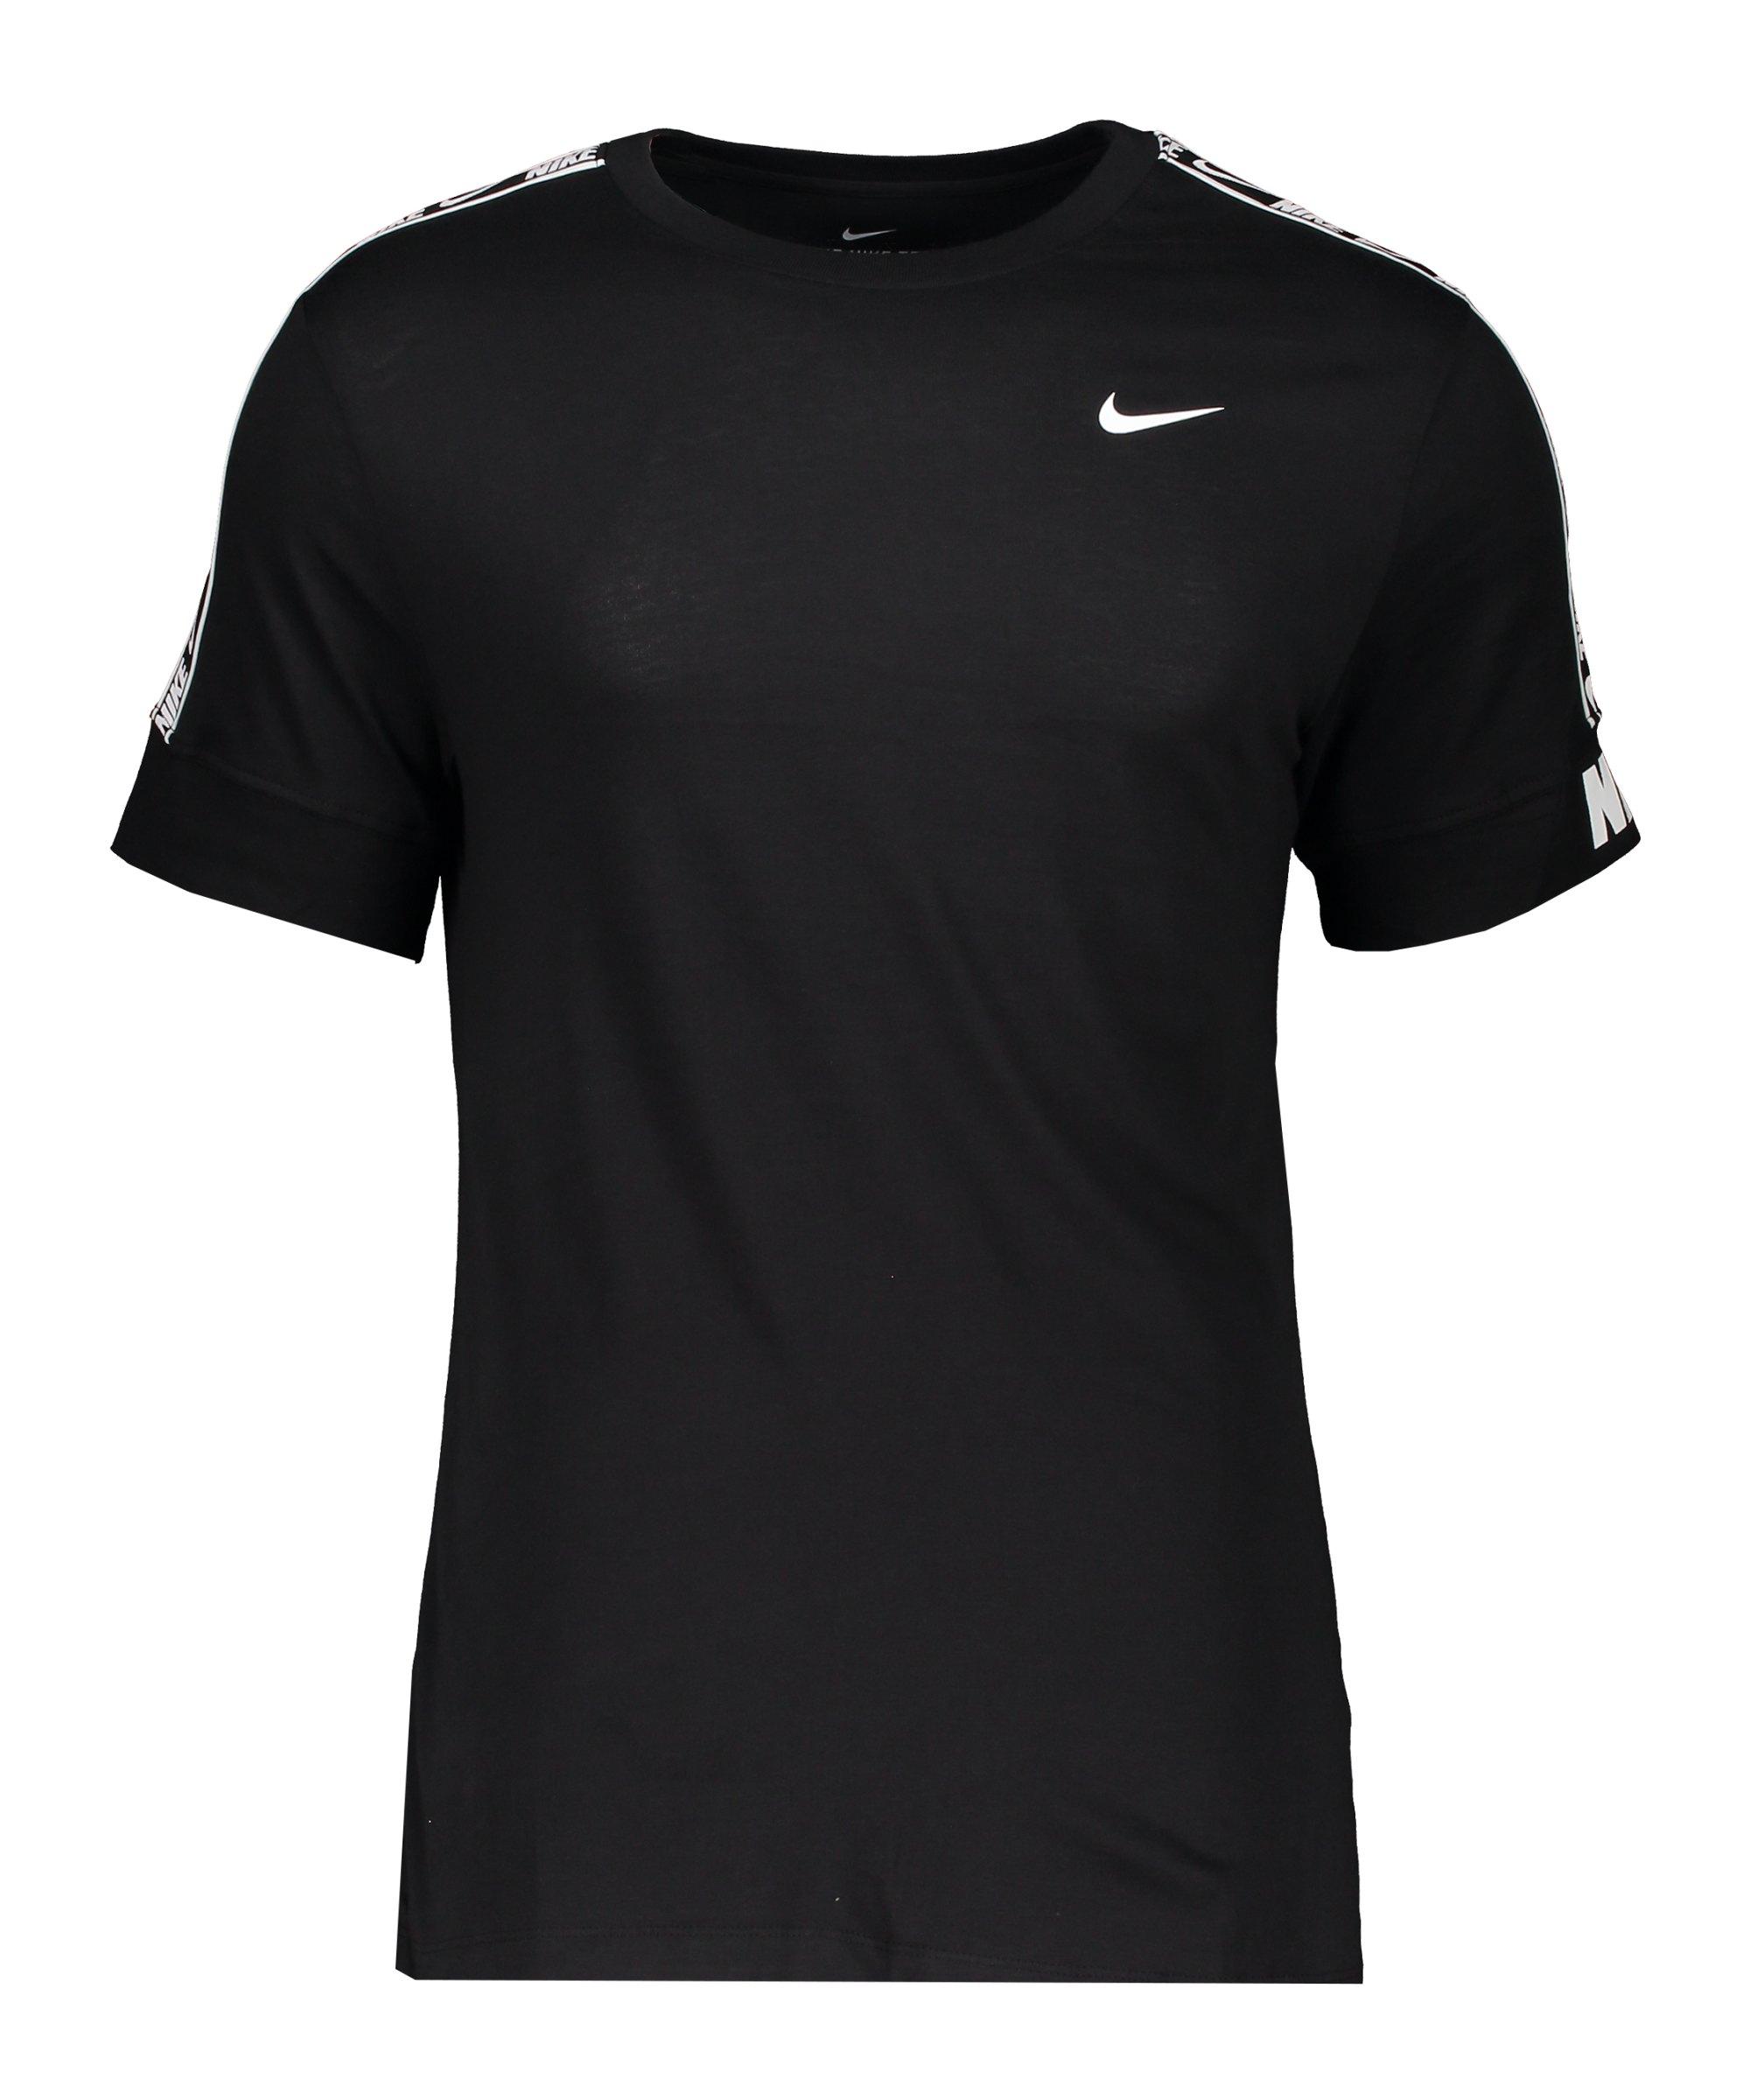 Nike Repeat T-Shirt Schwarz Weiss F013 - schwarz